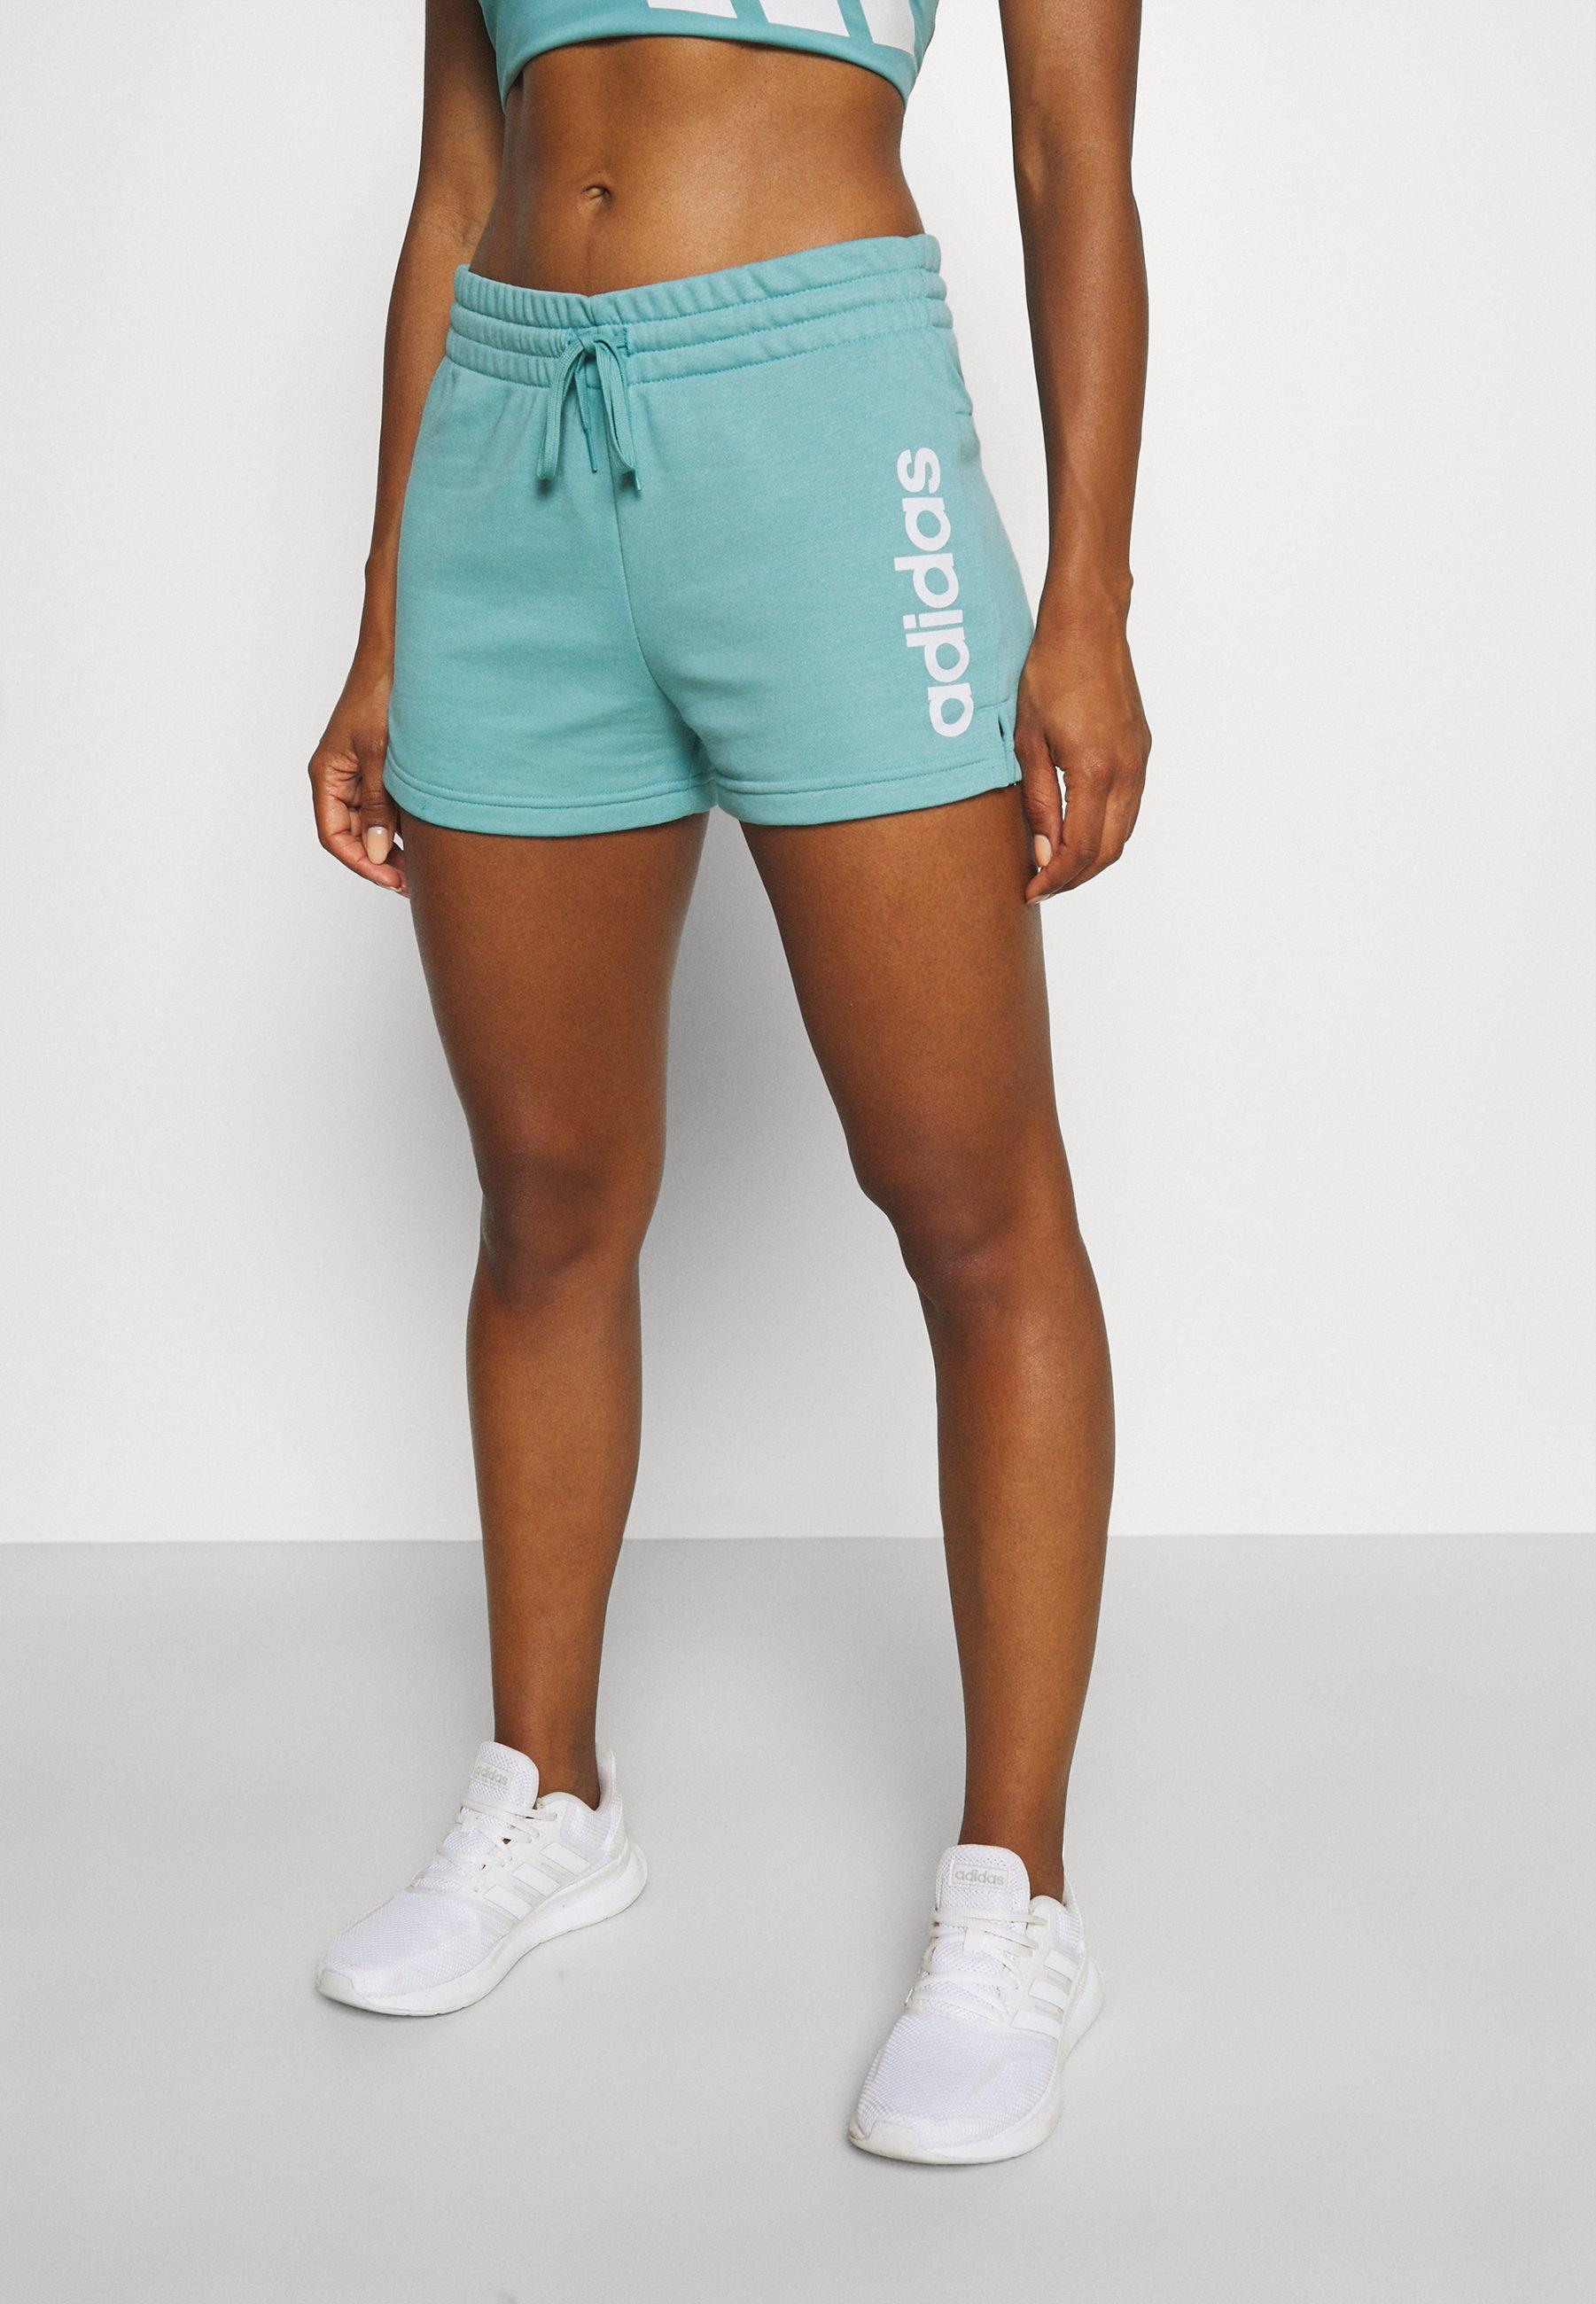 Damen ESSENTIALS SLIM LOGO SHORTS - kurze Sporthose